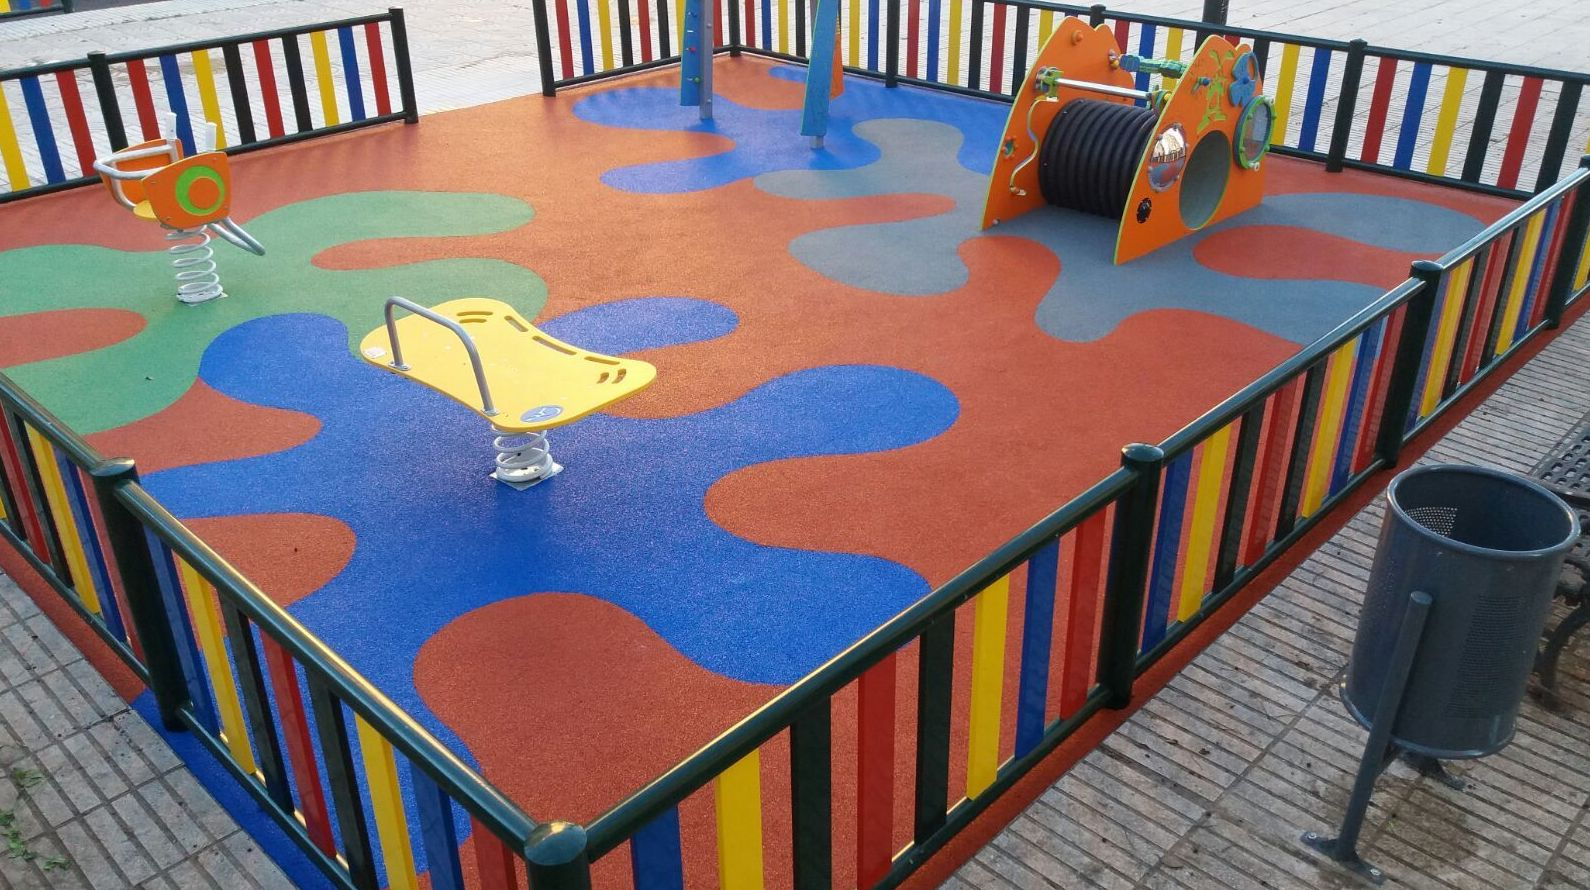 Foto 63 de Instalación de pavimentos de caucho para parques infantiles en Las Cabezas de San Juan | Pavimentos Garvel